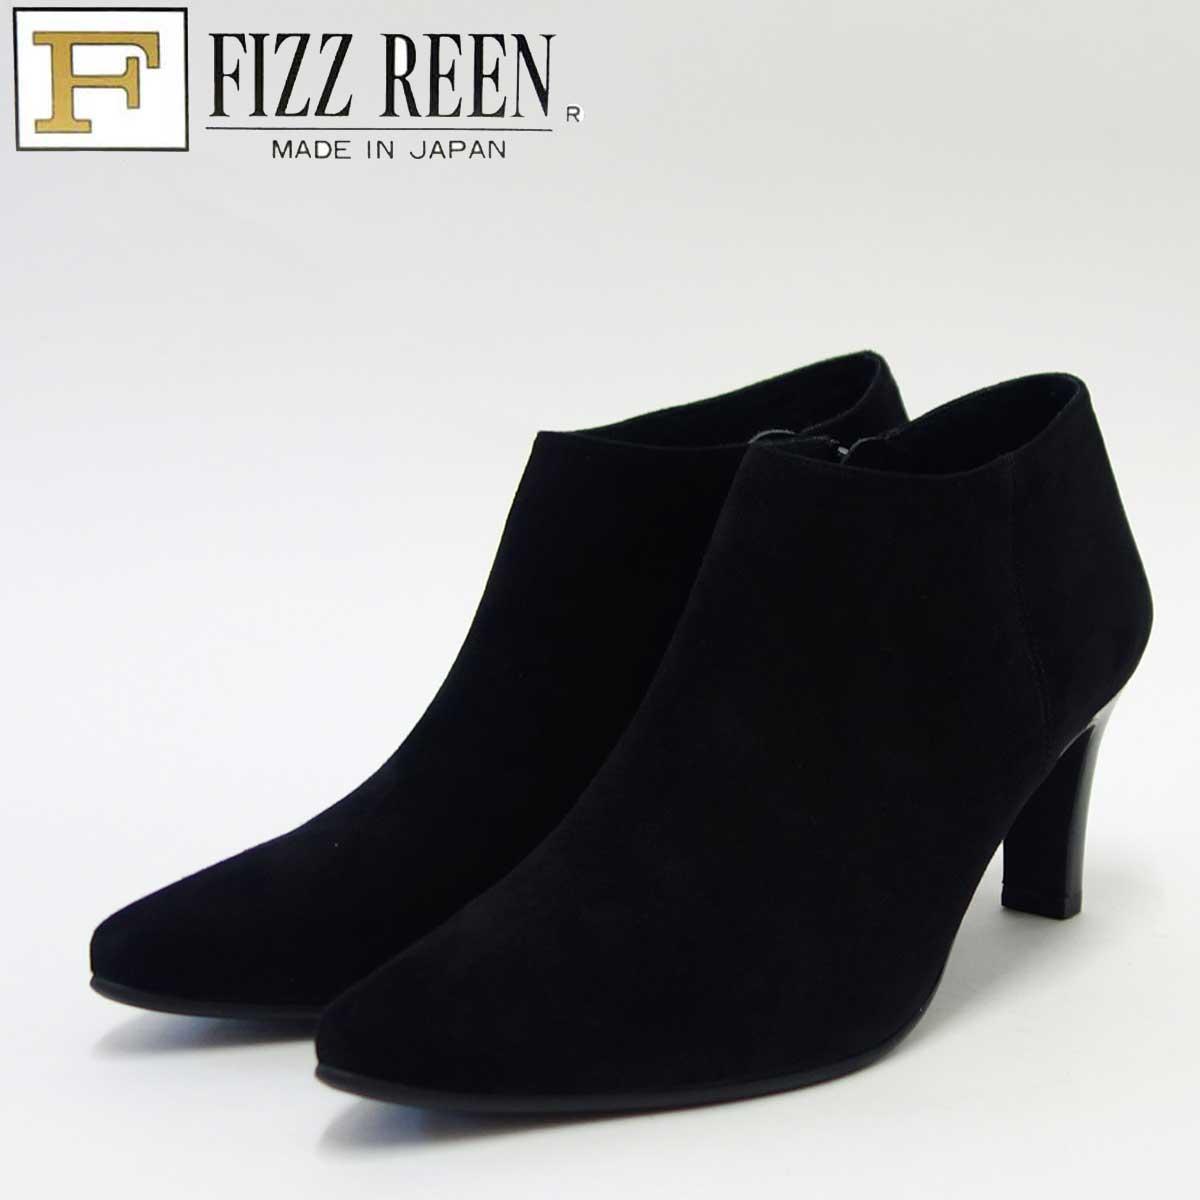 FIZZ REEN フィズリーン 8550 ブラックスエード(日本製)天然皮革のスタイリッシュブーティ「靴」